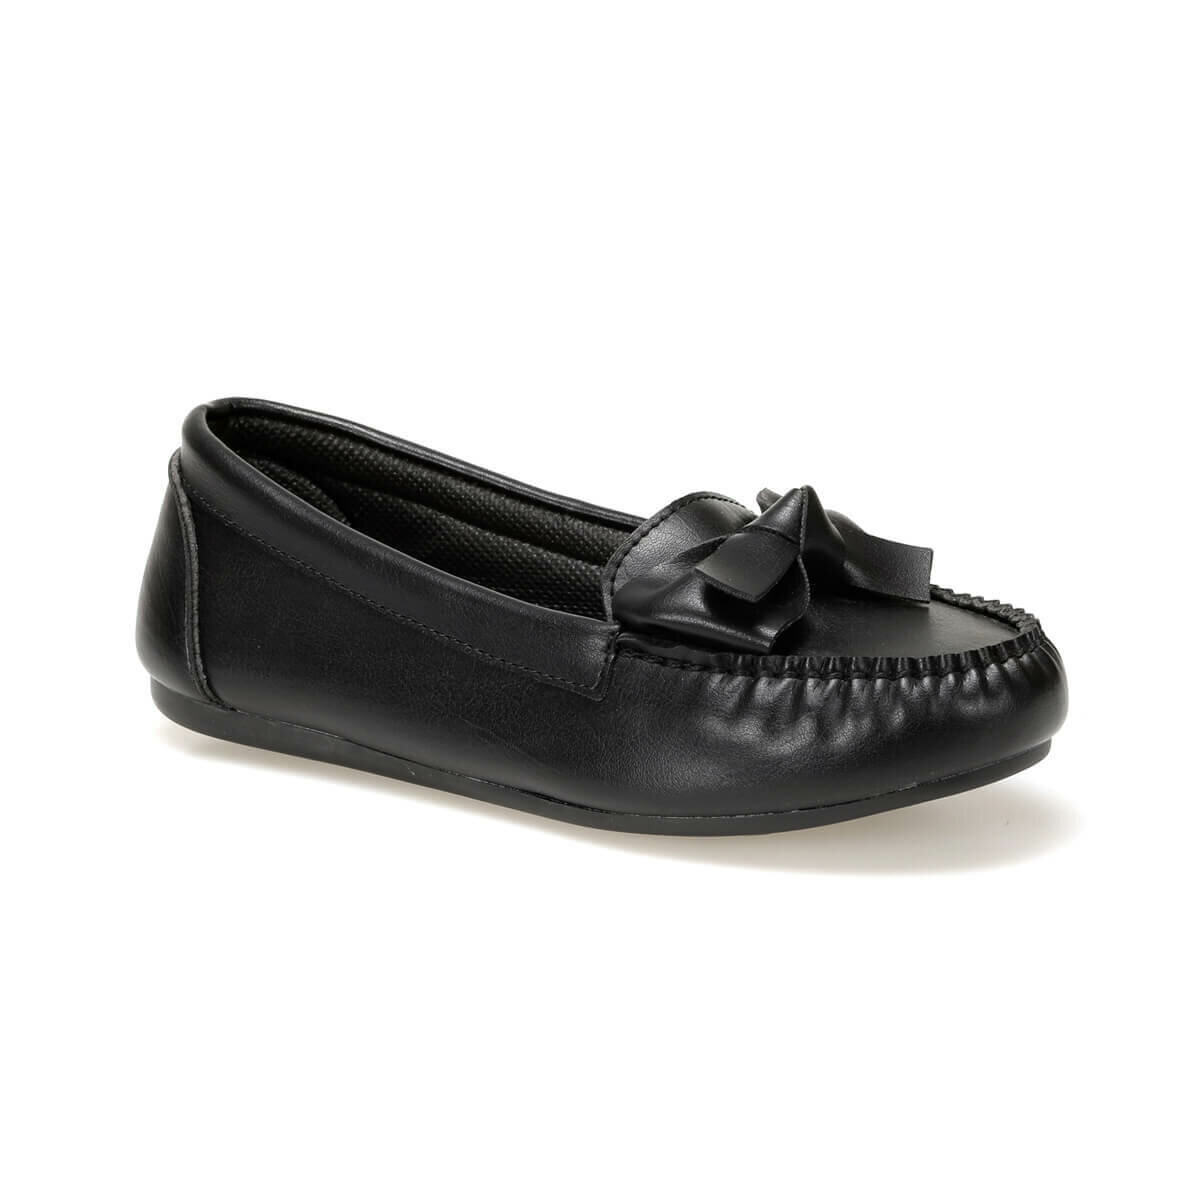 FLO DW17057-19K Black Women Loafer Shoes Miss F